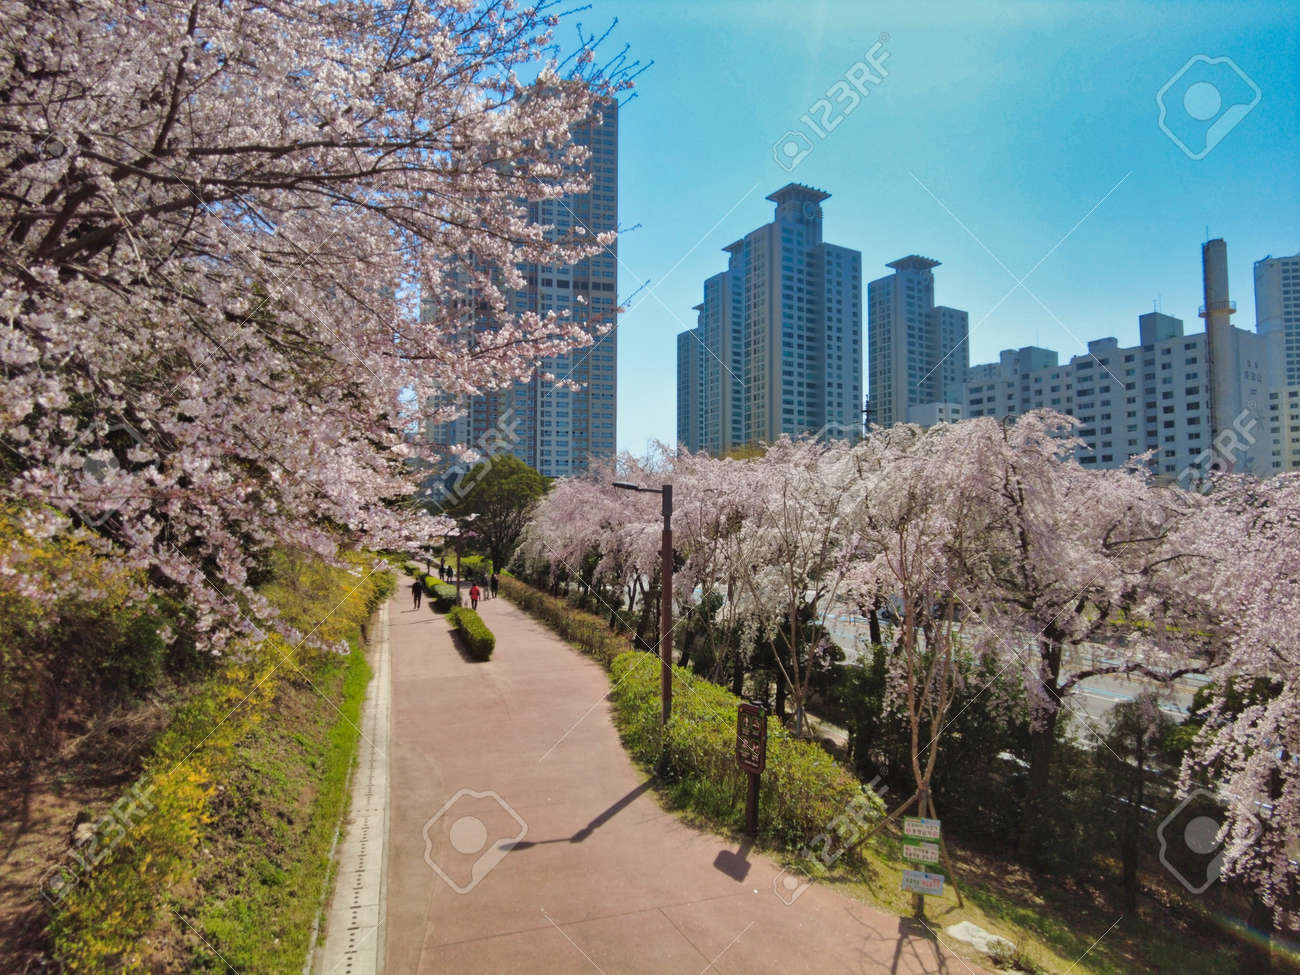 Cheery blossom blooming in haeundae, Busan, South Korea, Asia - 167142911